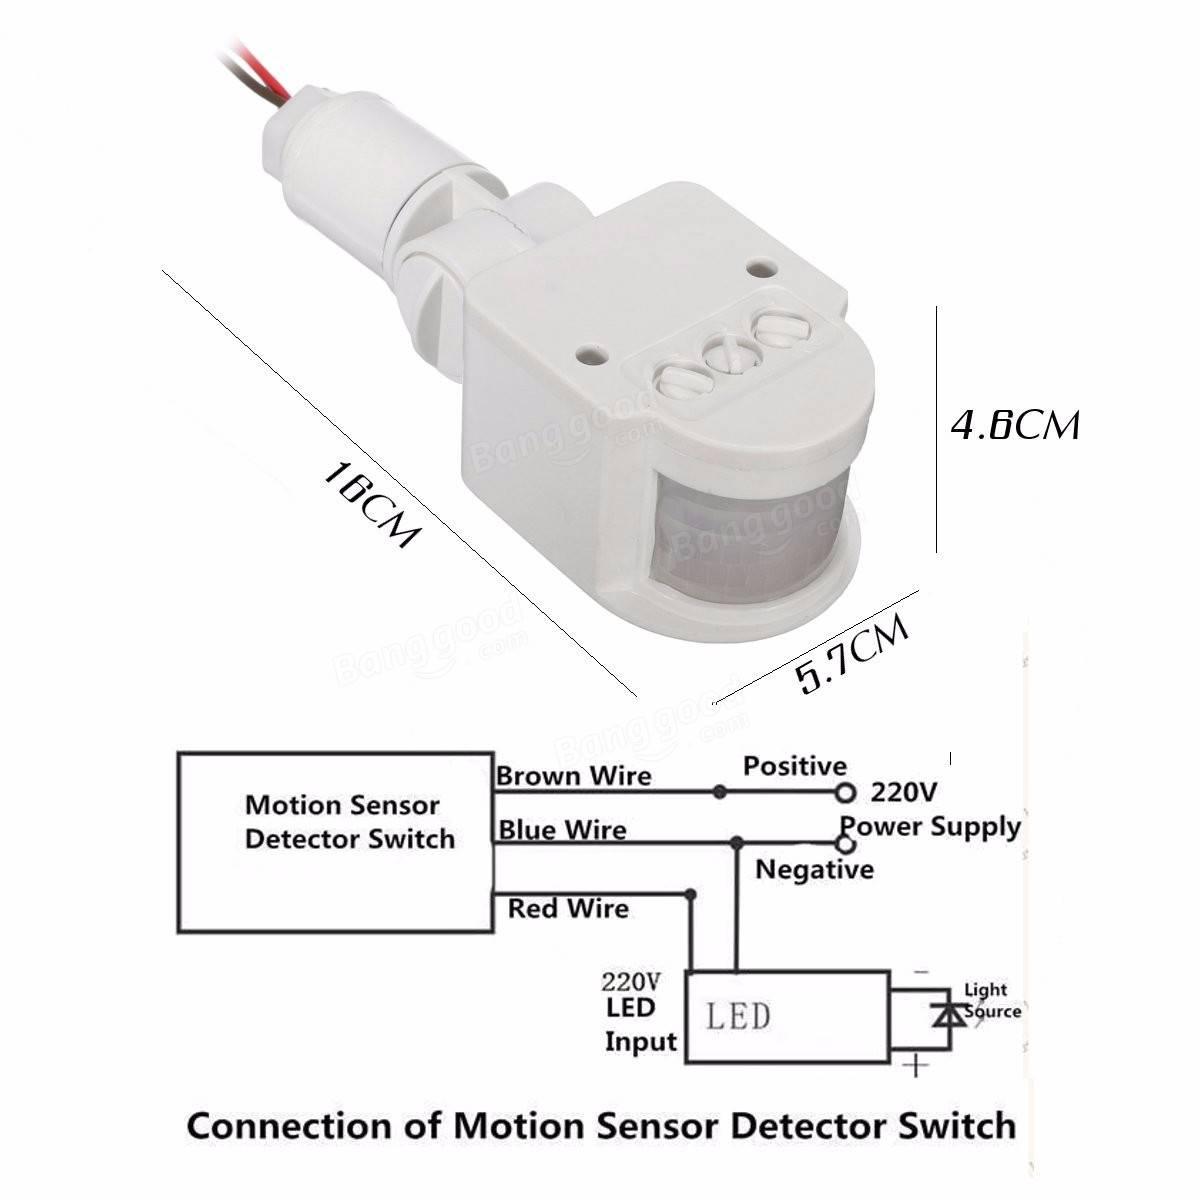 hight resolution of pir security light wiring diagram wiring diagram for motion sensor